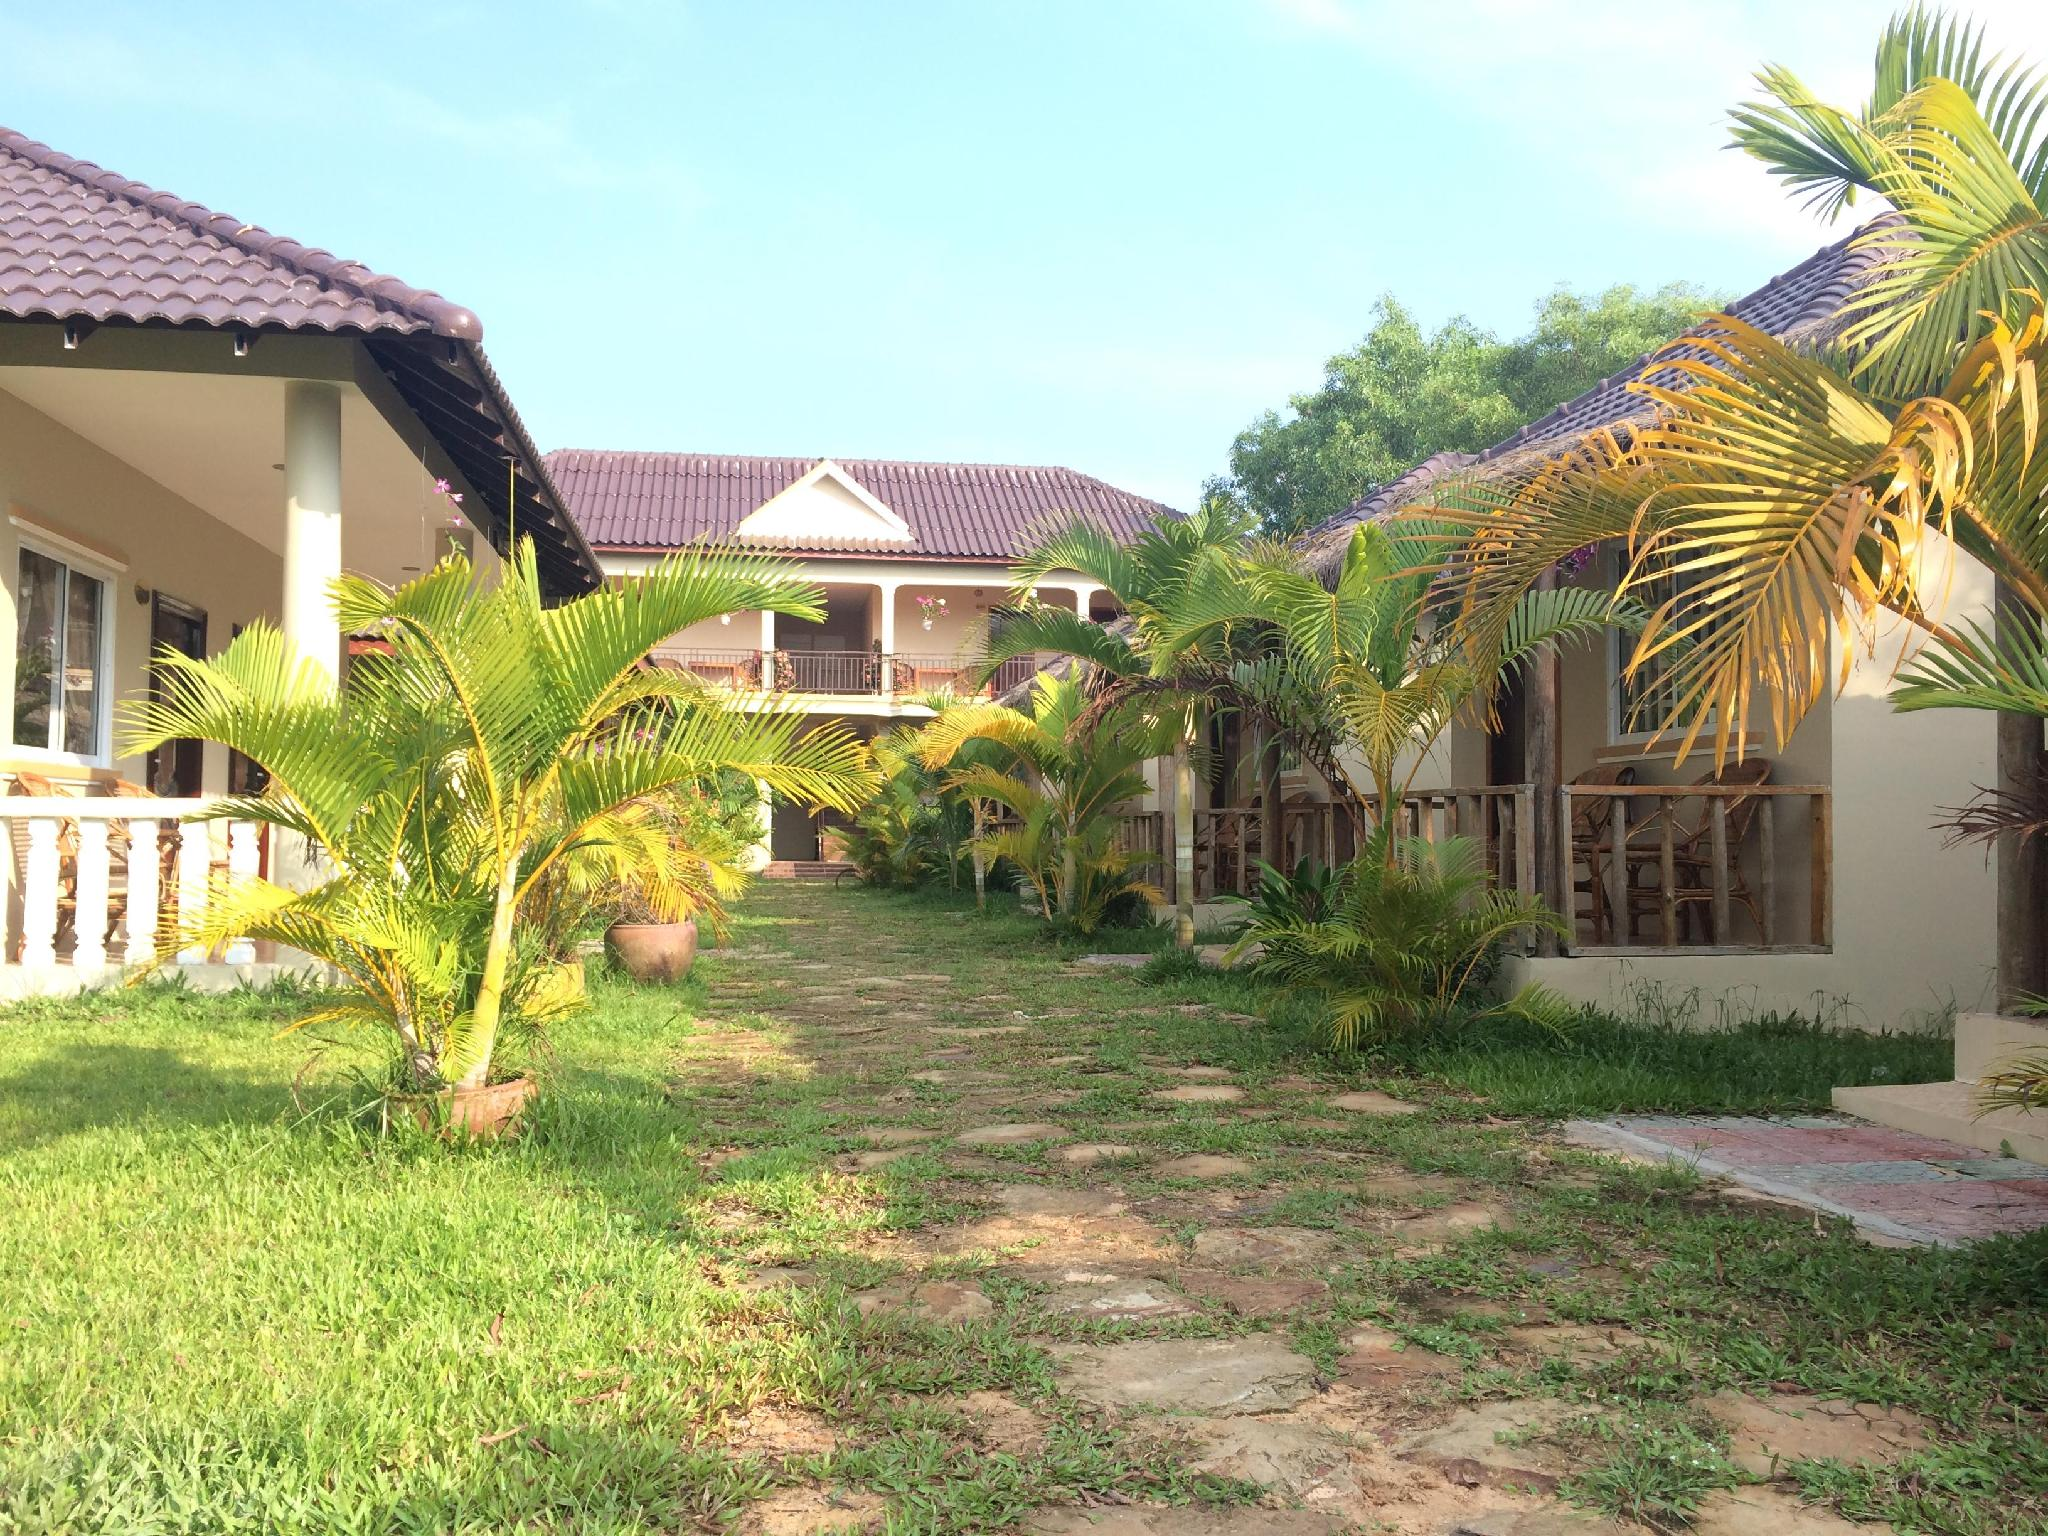 The MoonFlower Bungalow - Sihanoukville